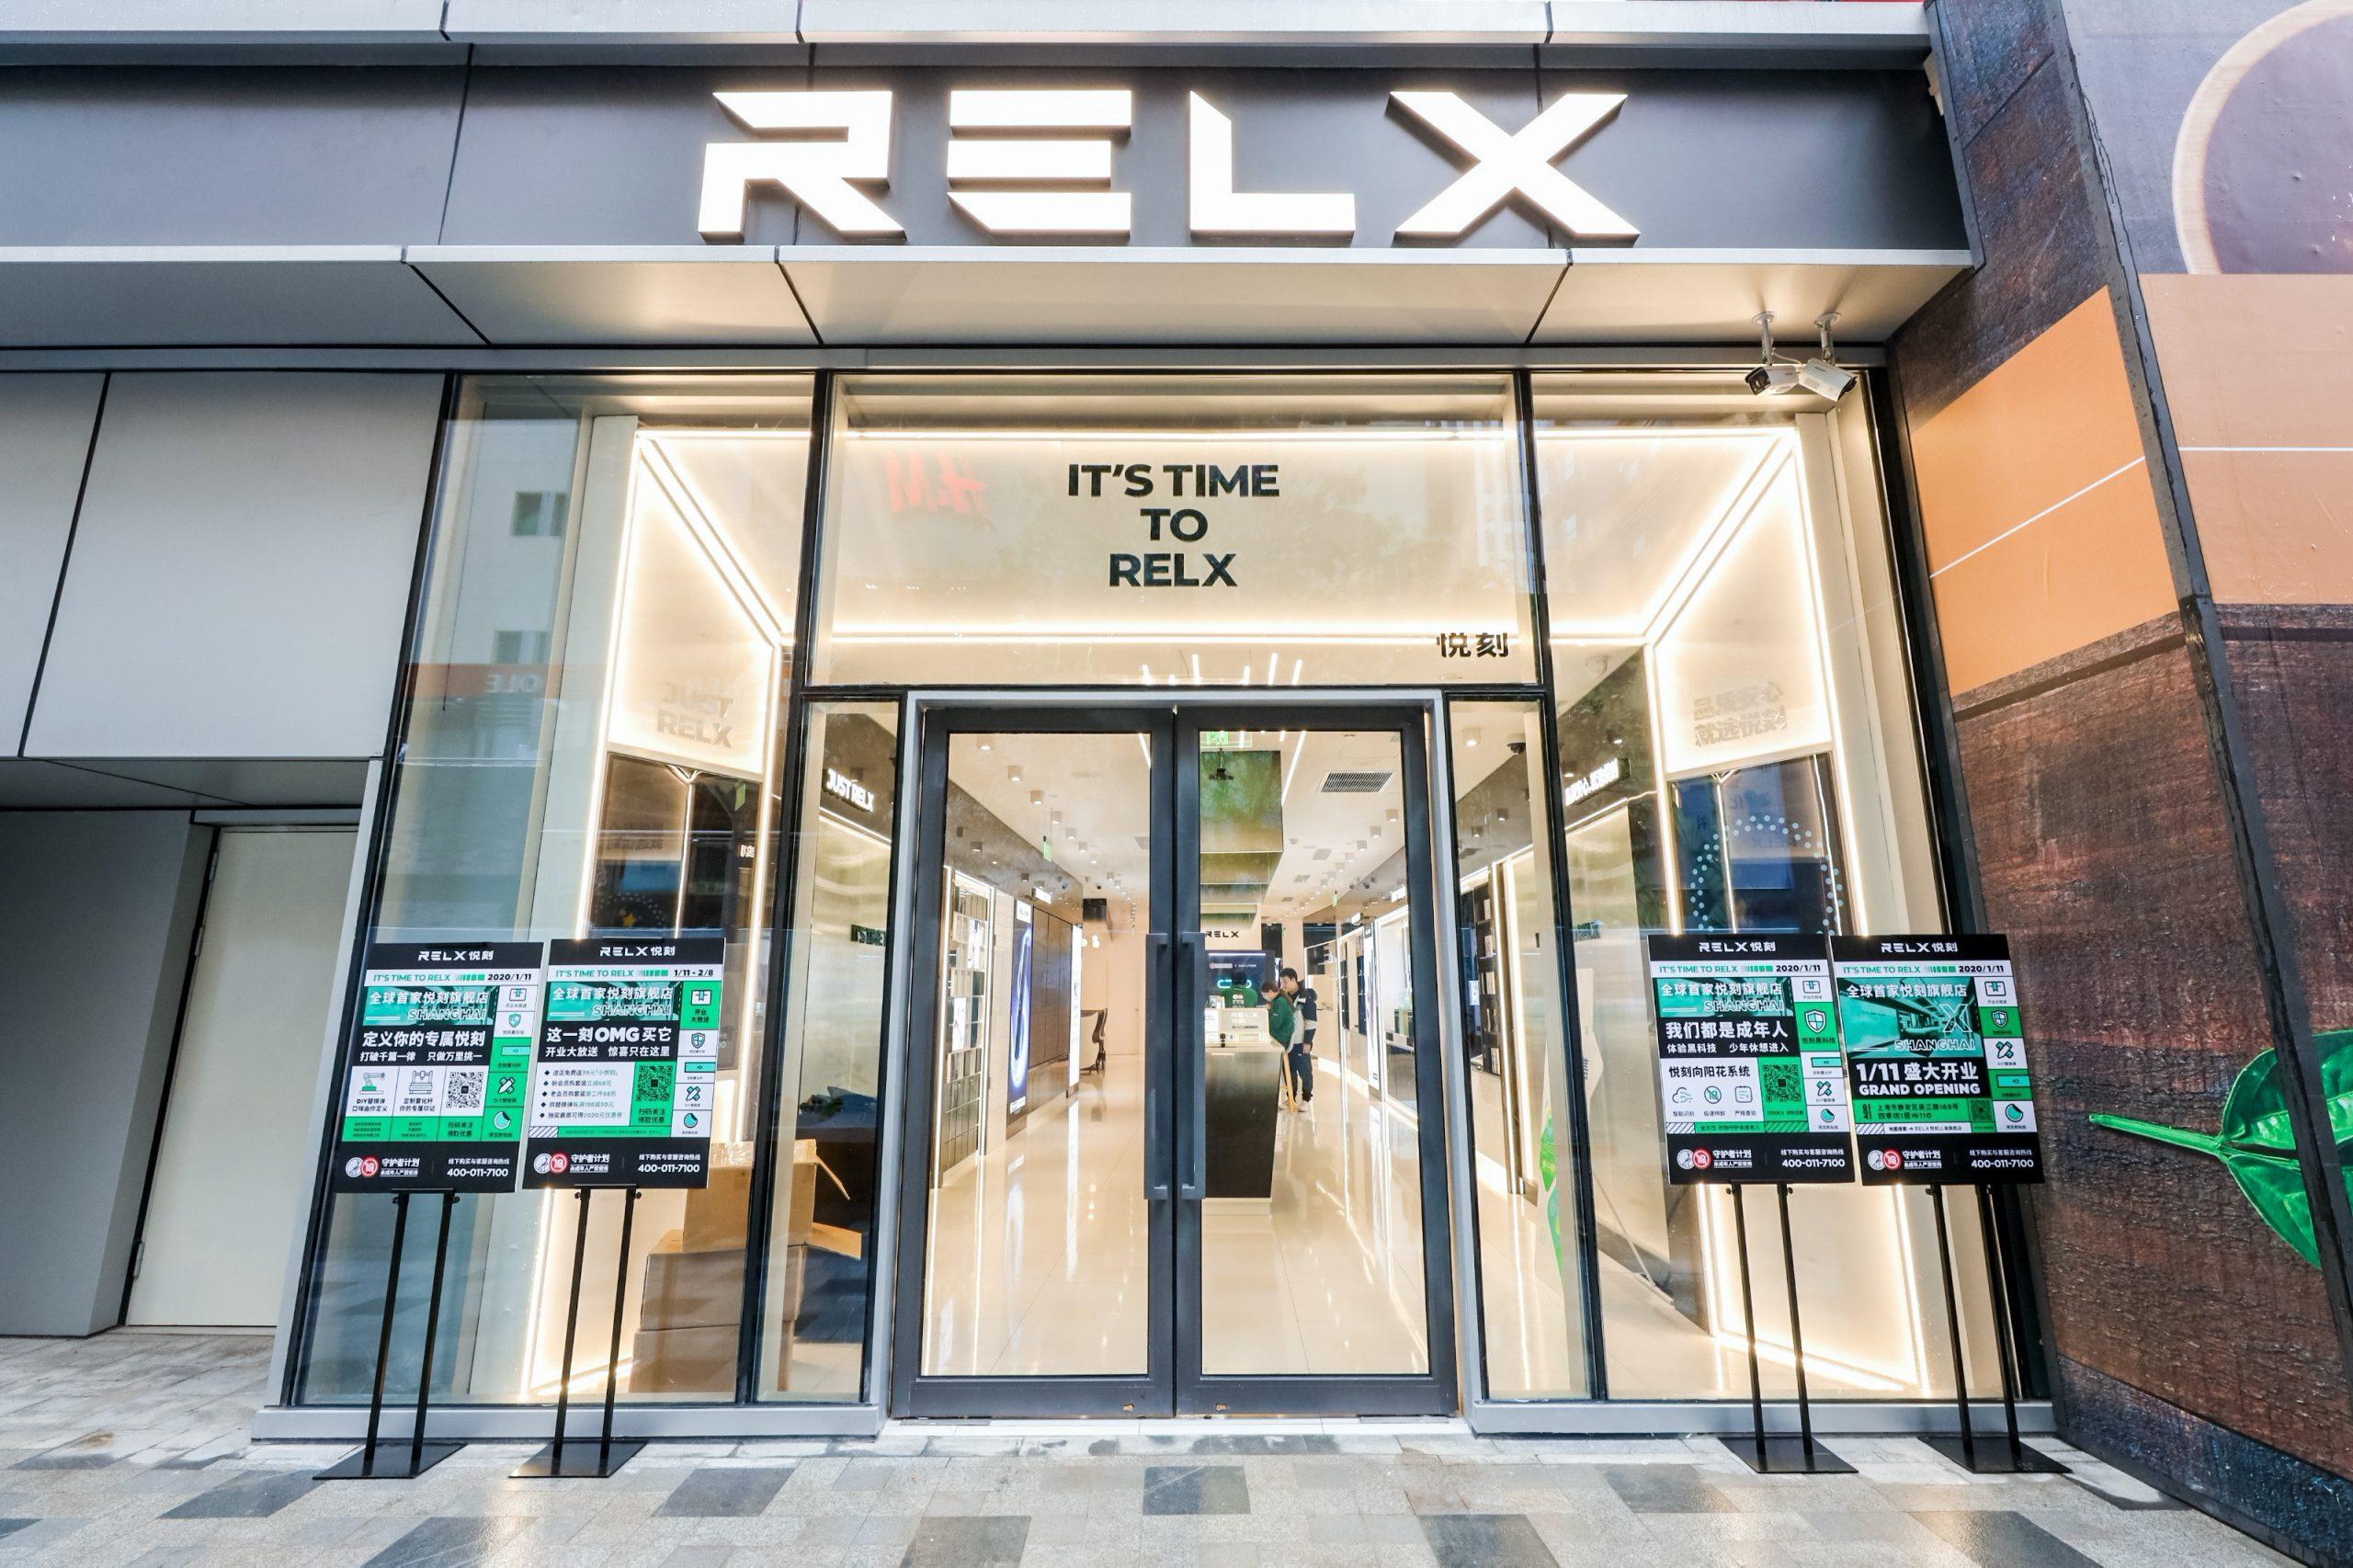 Relx vs Caliburn, Which Is Better? | Vapepenzone